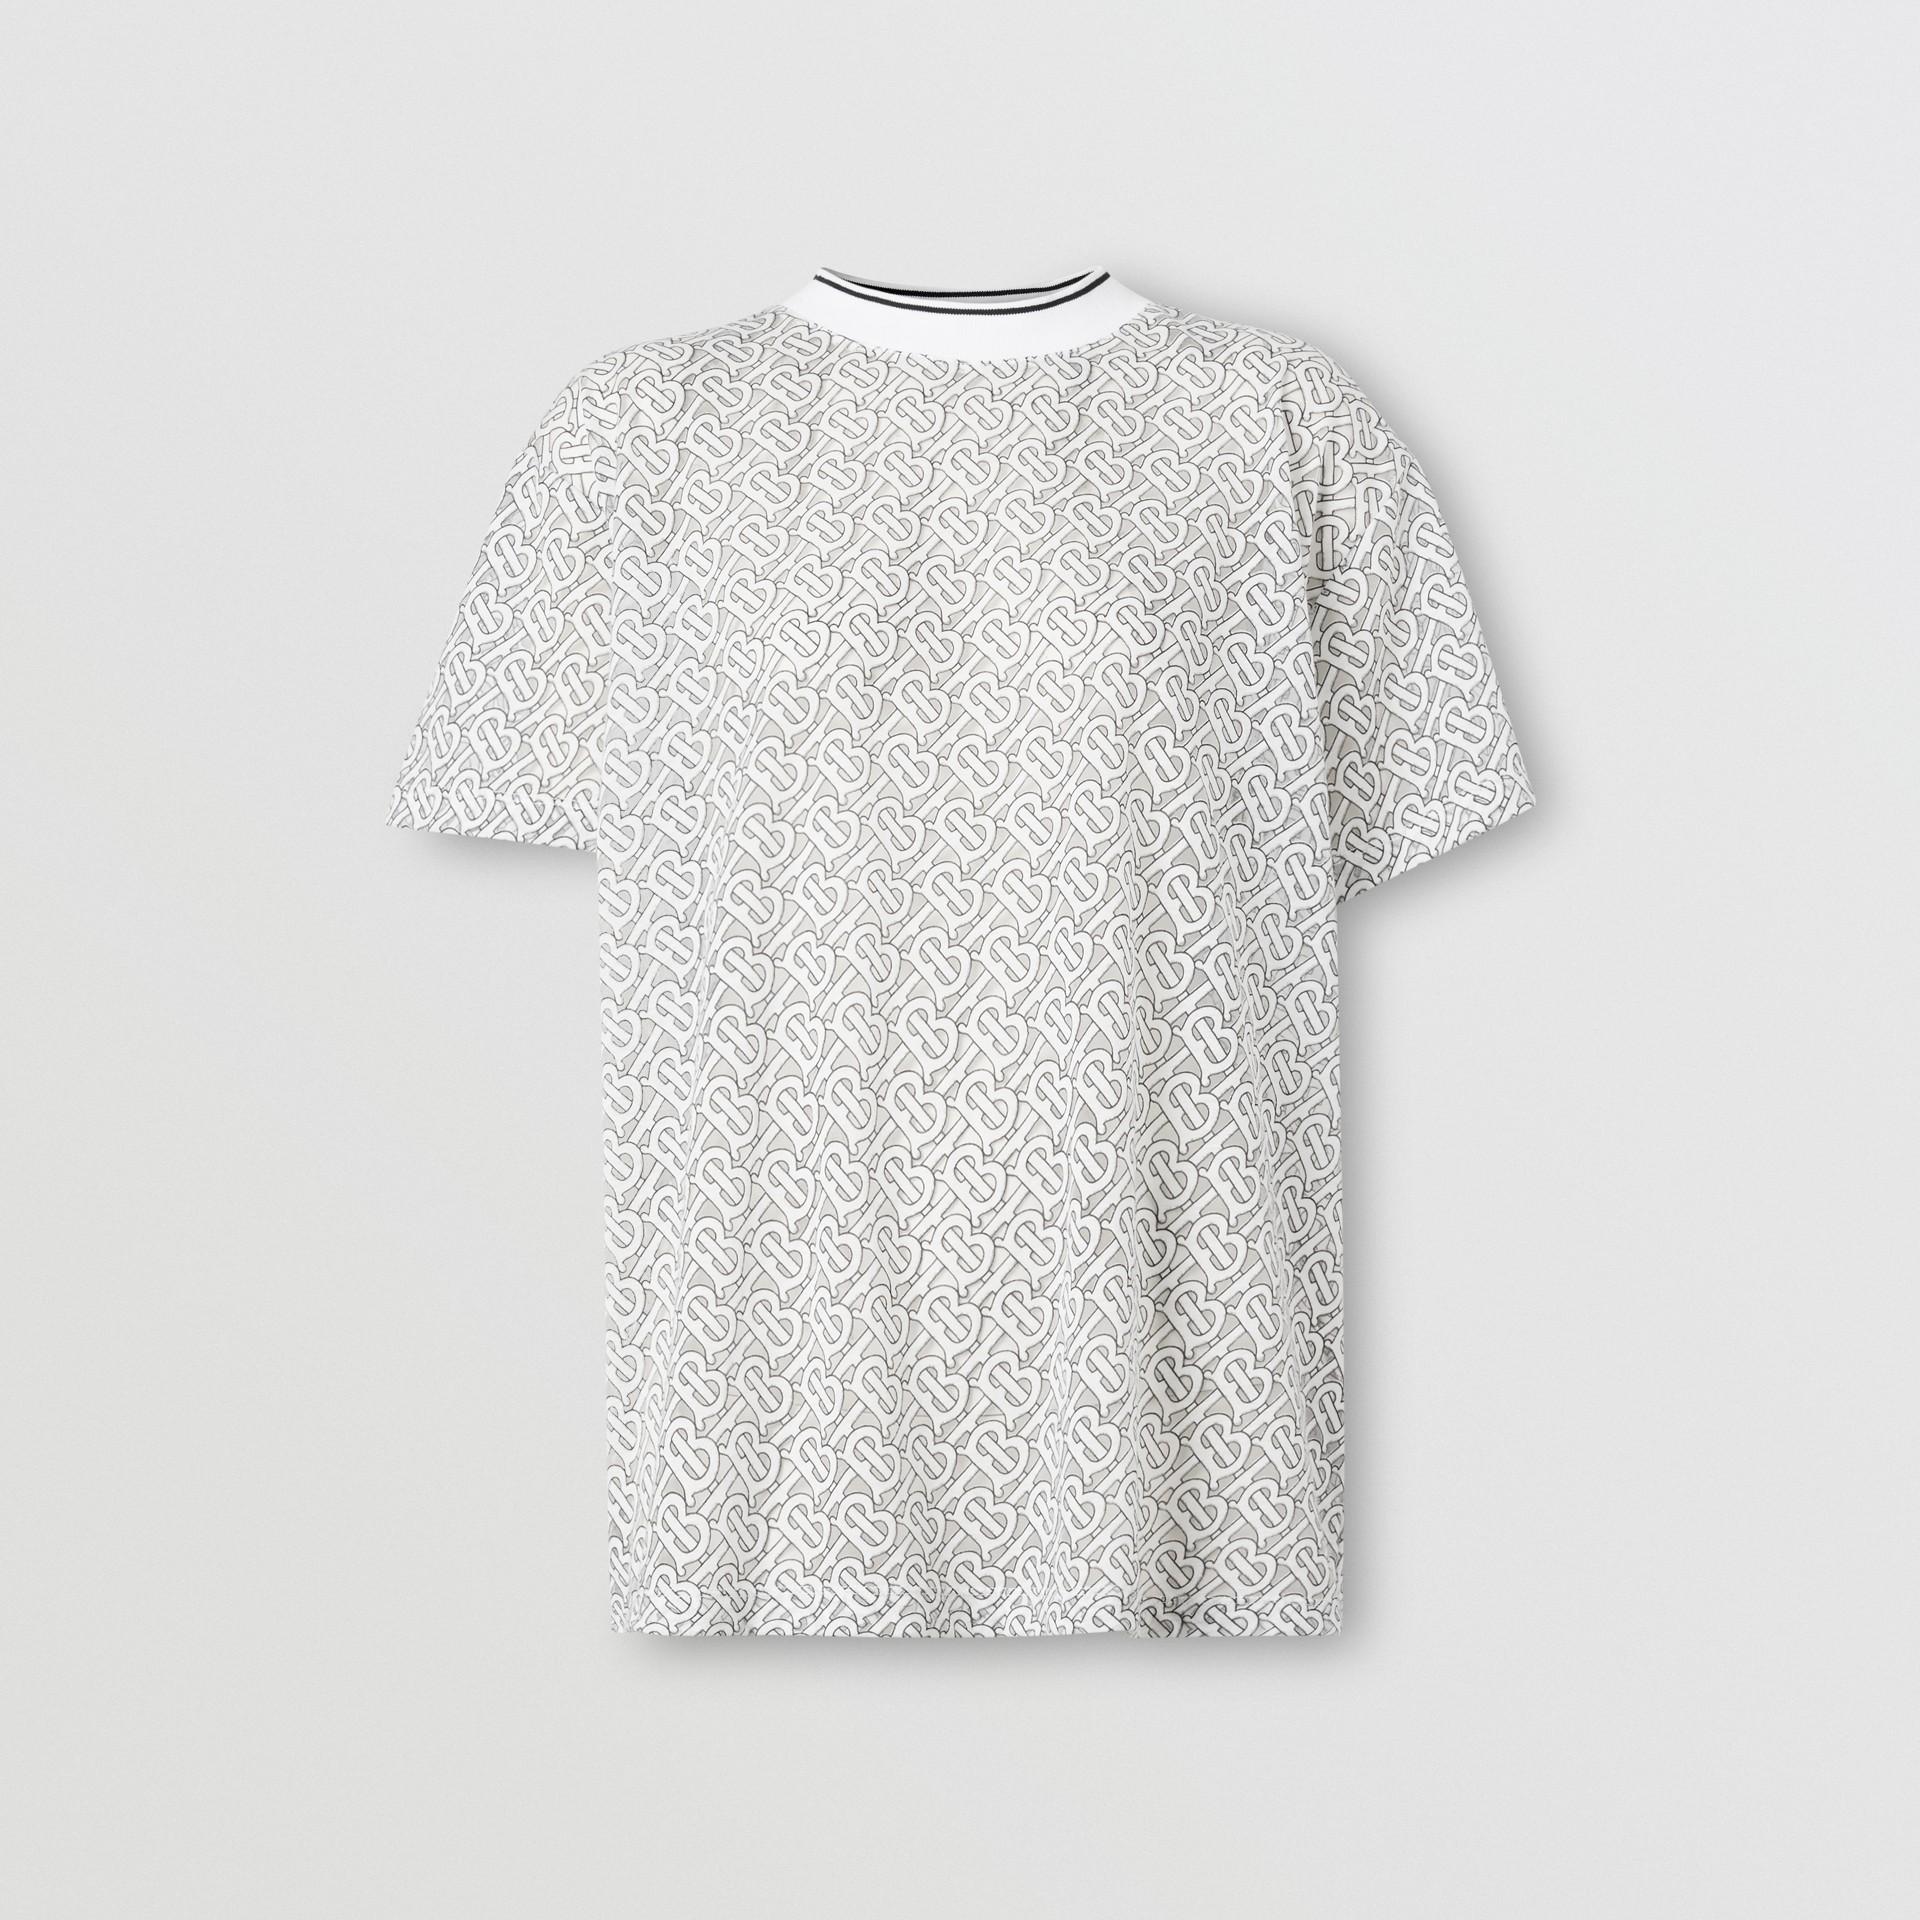 Monogram Devoré Oversized T-shirt in Off-white - Women   Burberry - gallery image 3